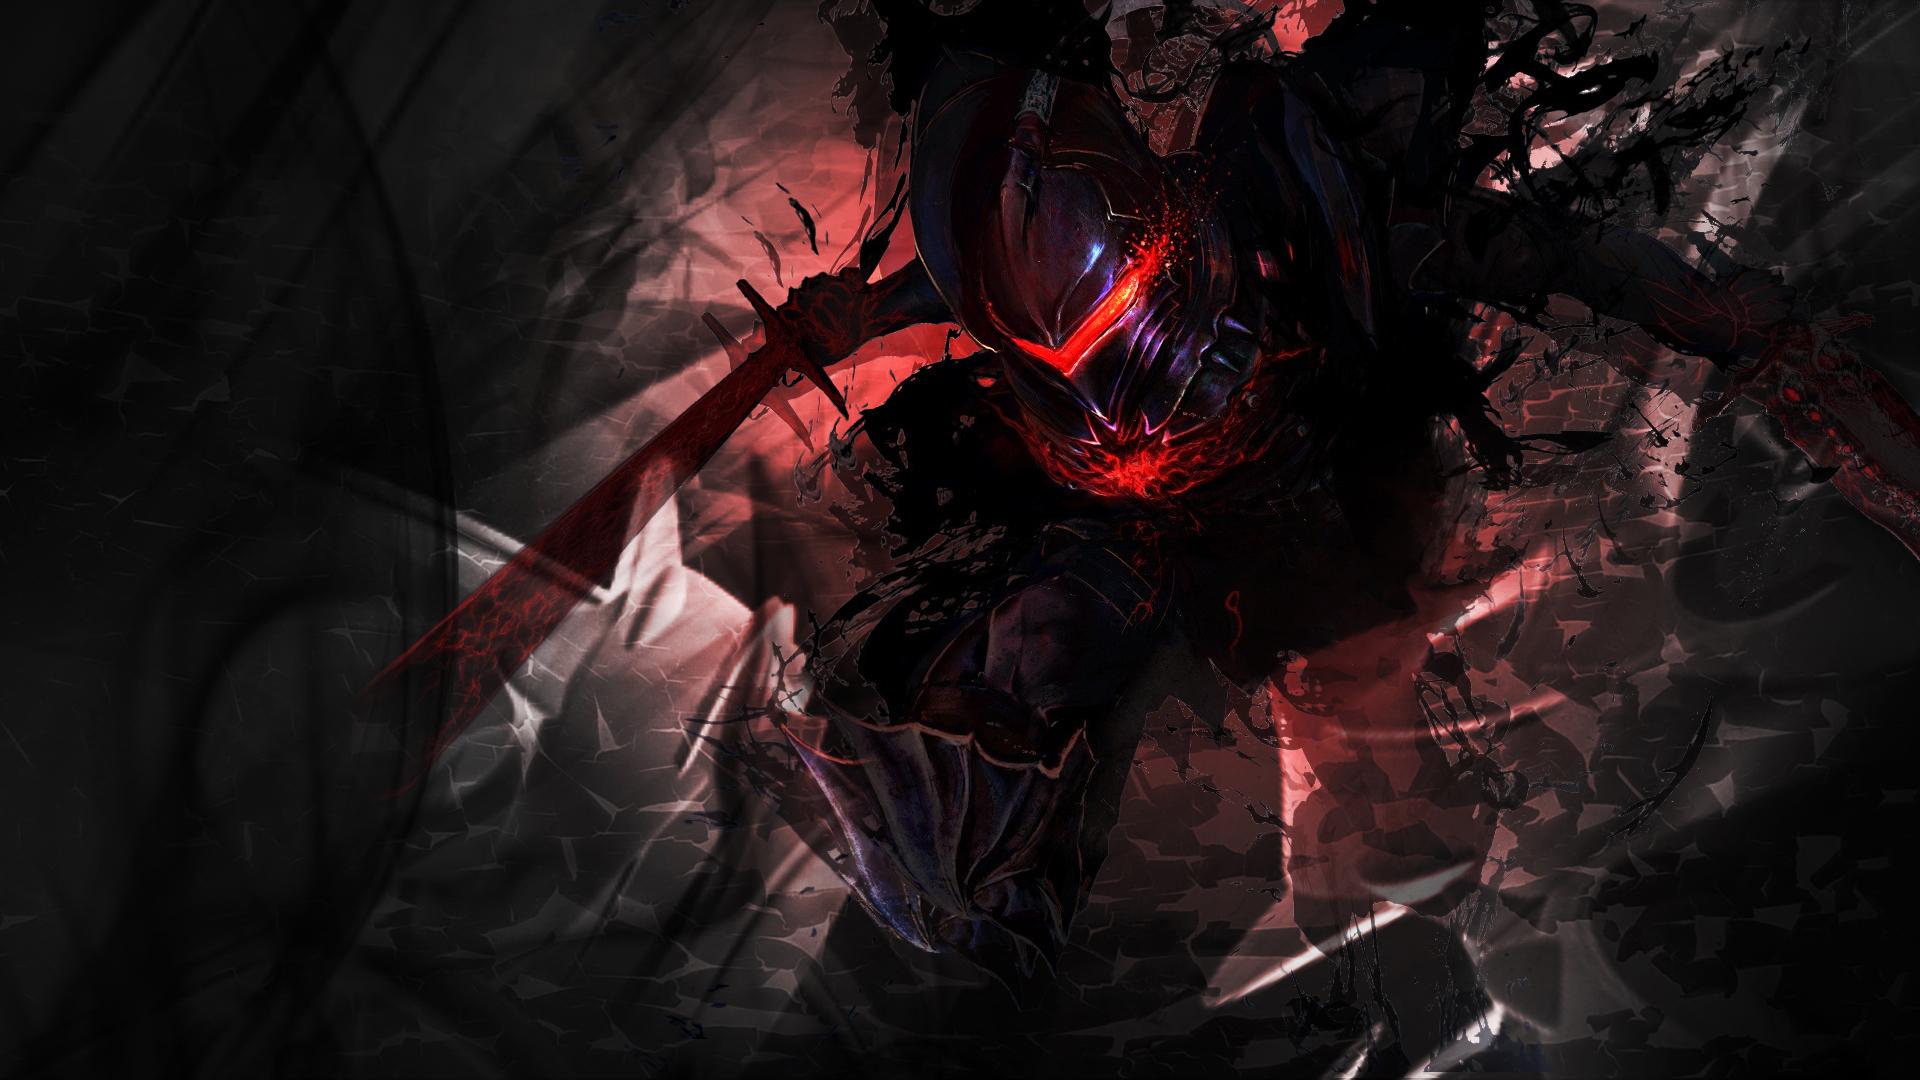 berserker hd wallpaper and background image